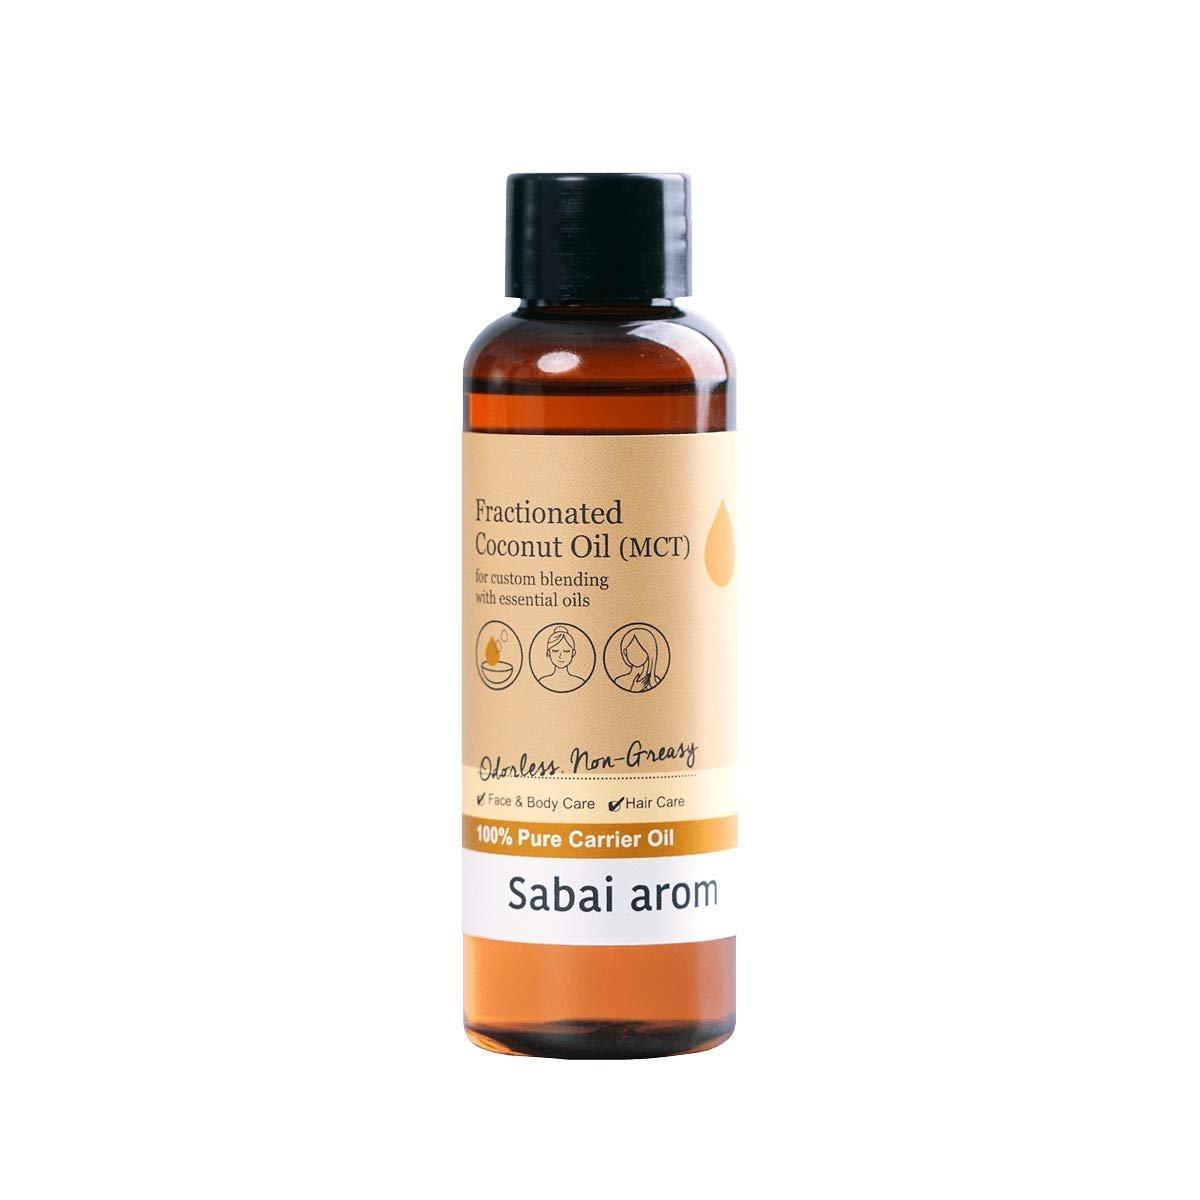 SABAI AROM Fractionated Coconut Oil 117 g. (2 Pack)